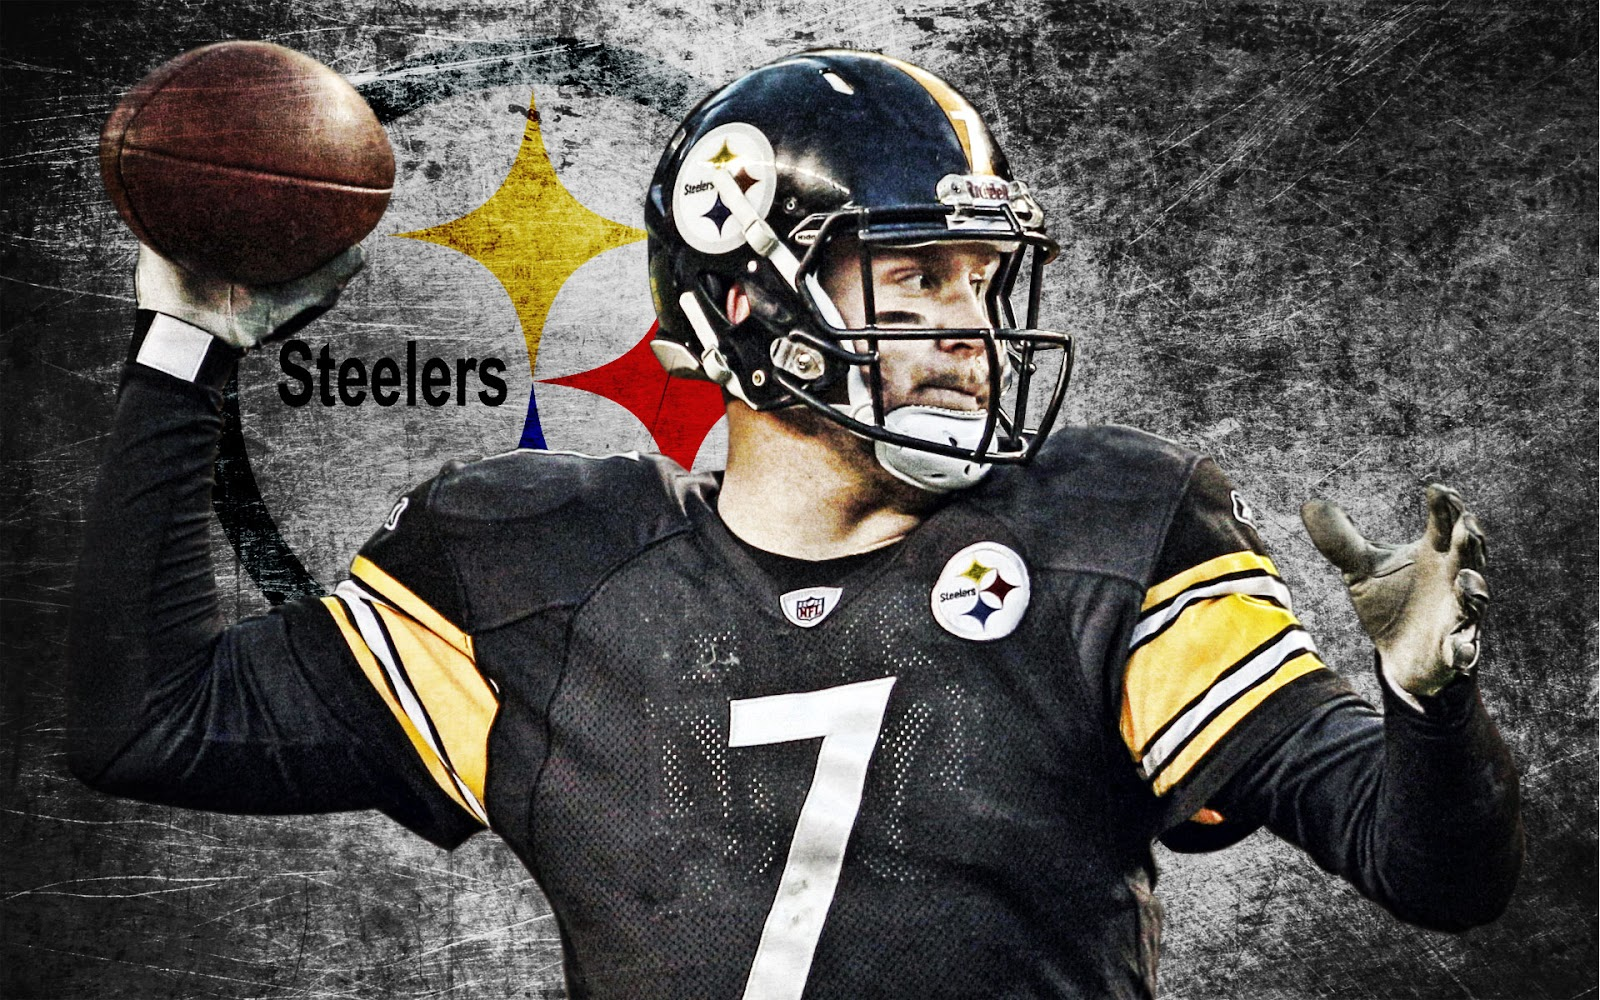 Wallpaper Back To Steelers Main Page Pittsburgh Steelers Helmet 1600x1000